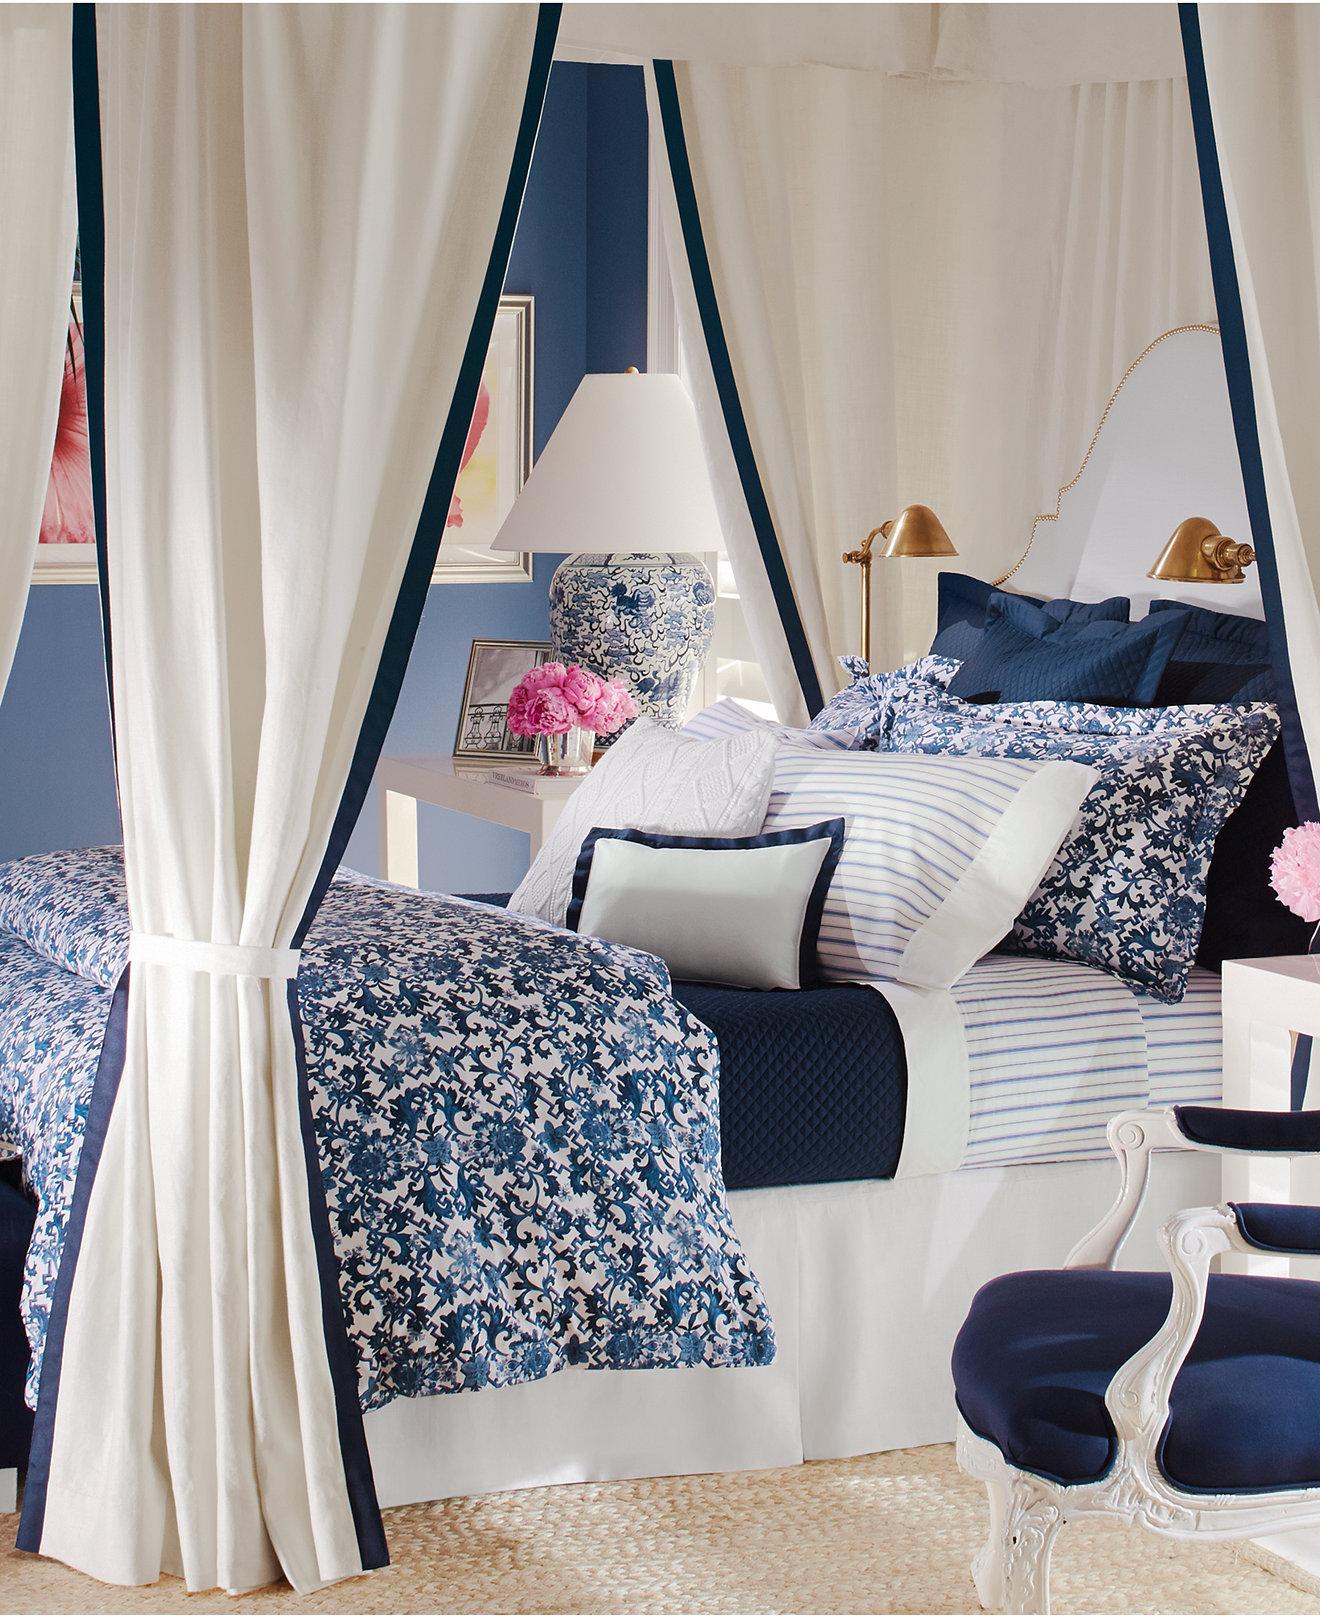 Ralph lauren polo bedding for girls - Larger View